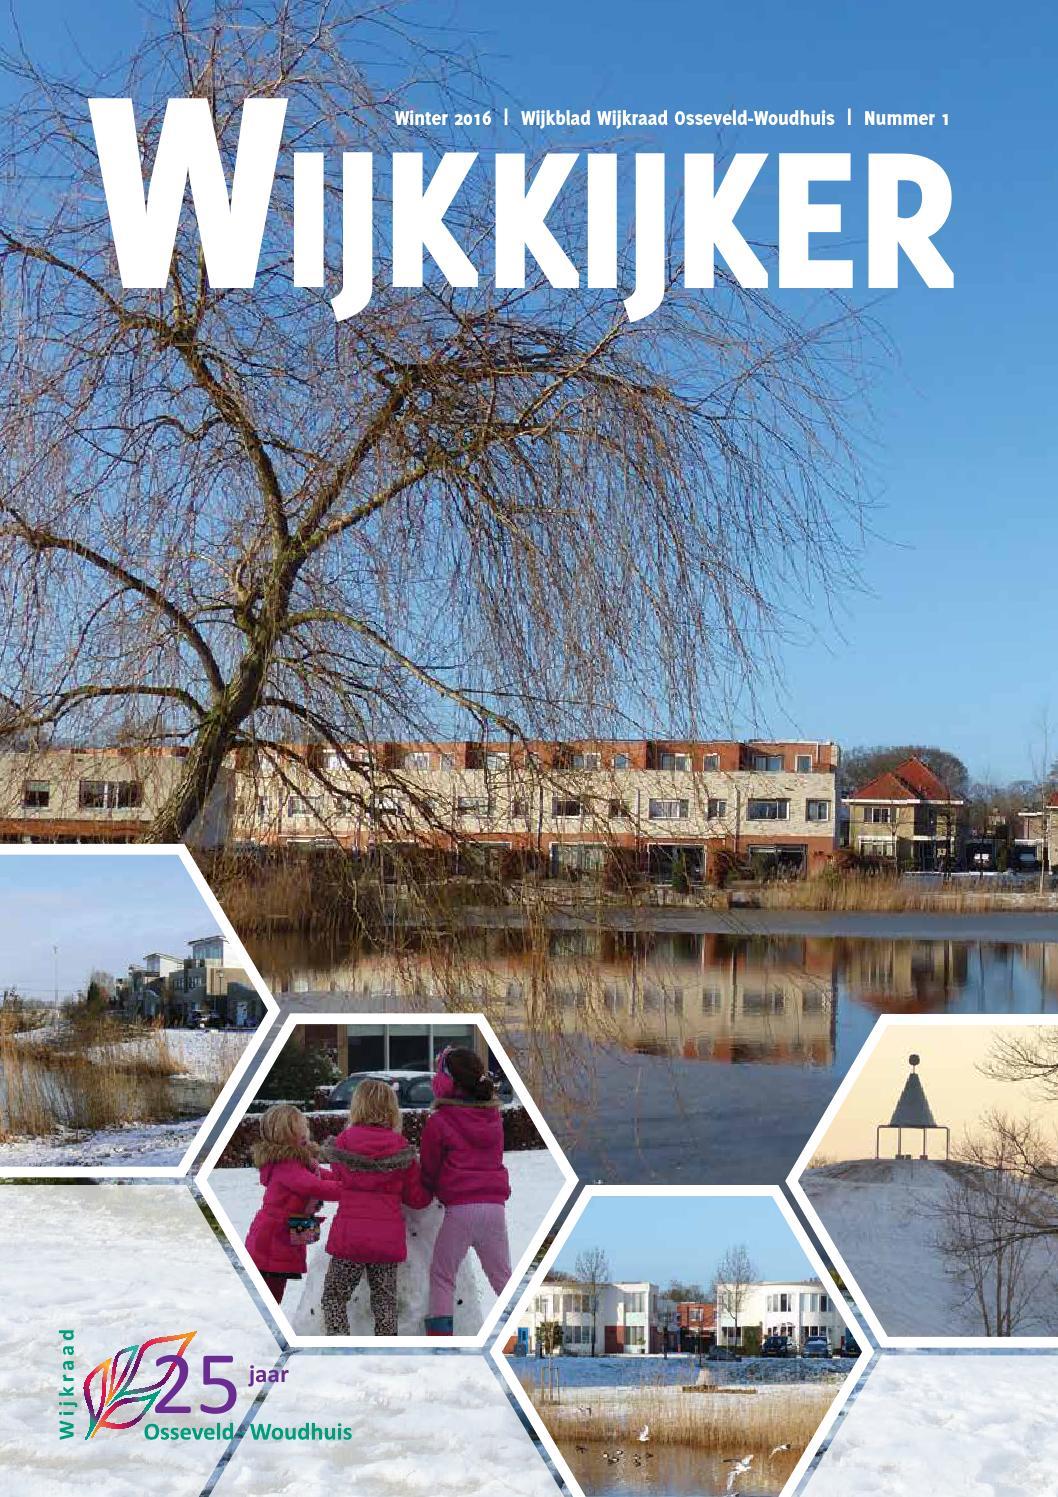 Winter 2016 wijkkijker by portfolio bijbeeld   issuu